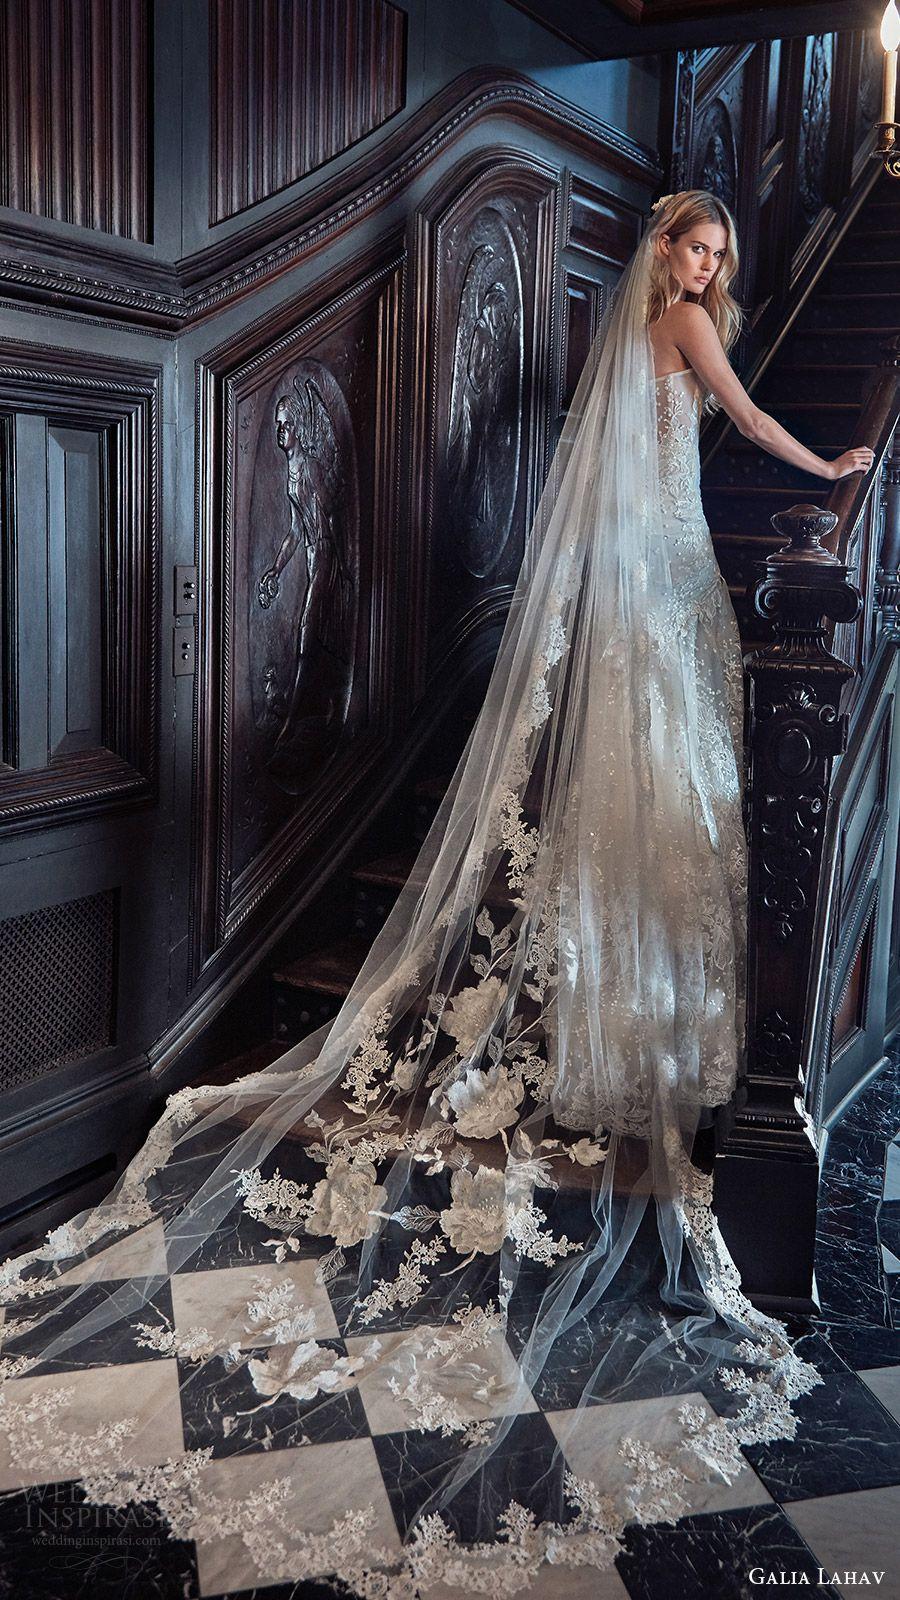 Manor Royal Wedding Dress : Galia lahav spring couture wedding dresses le